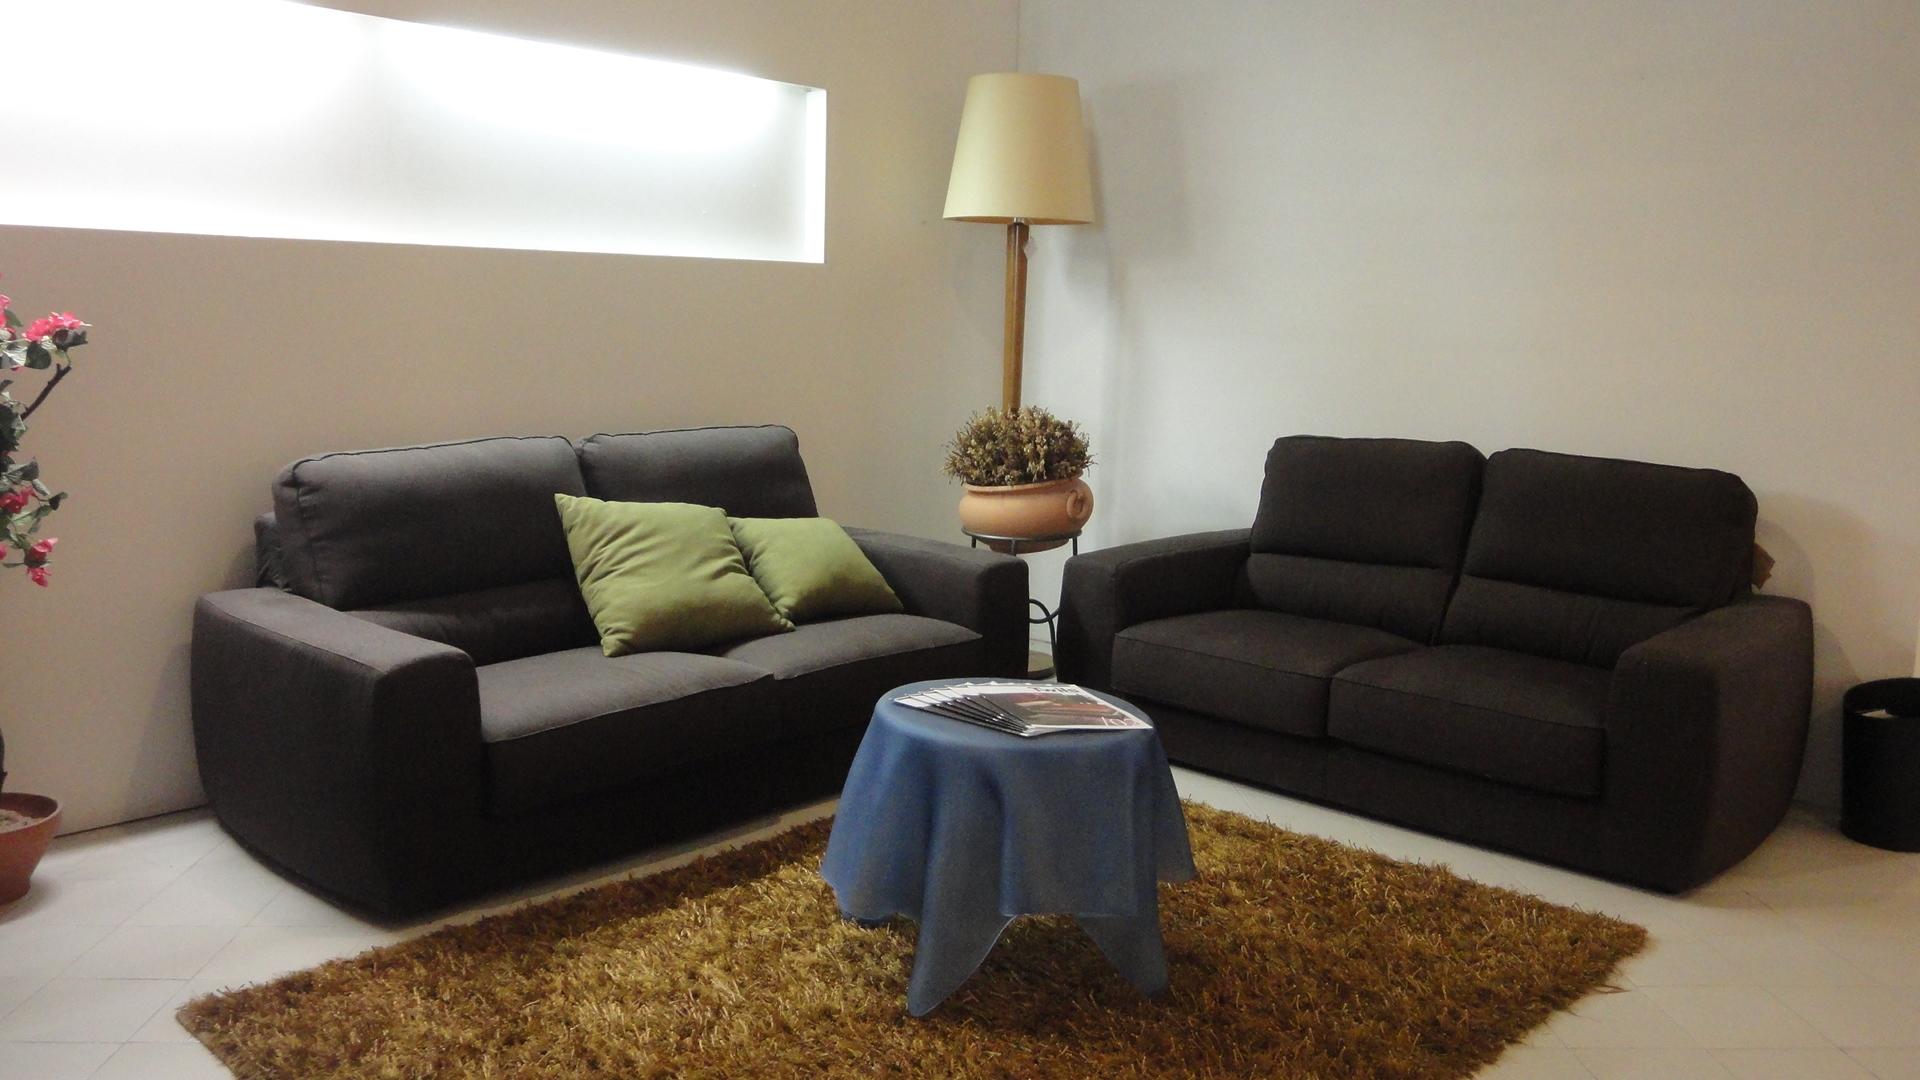 Divano lecomfort tommy divani lineari tessuto divano 4 for Divano 4 posti